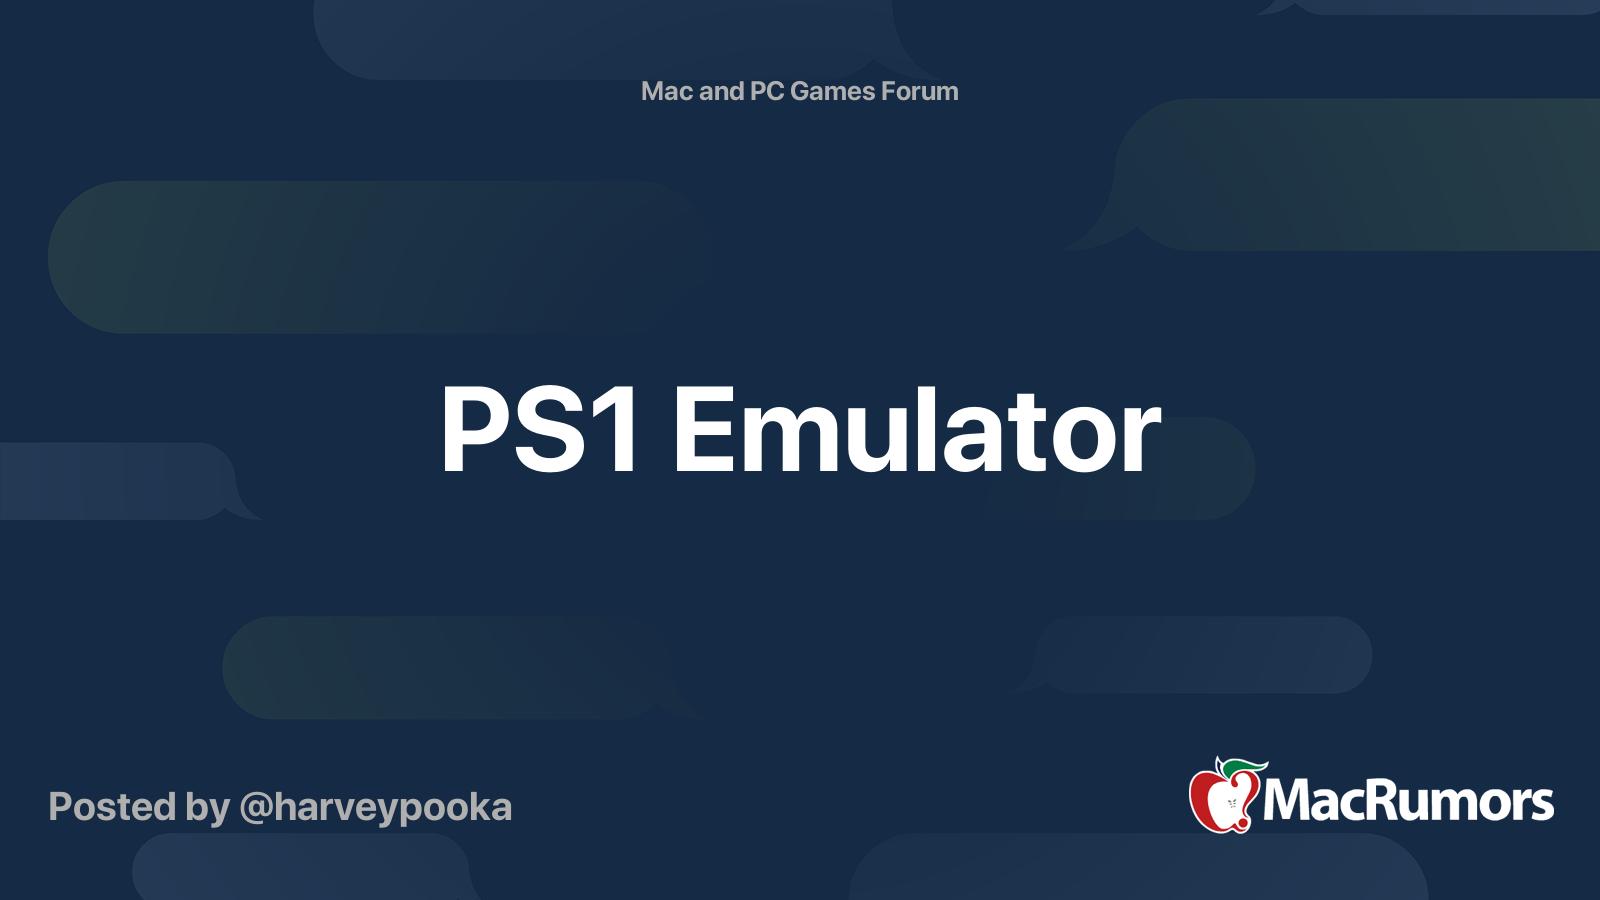 Cara Instal Emulator PS1 & 30 Game Terbaik, Bikin Nostalgia